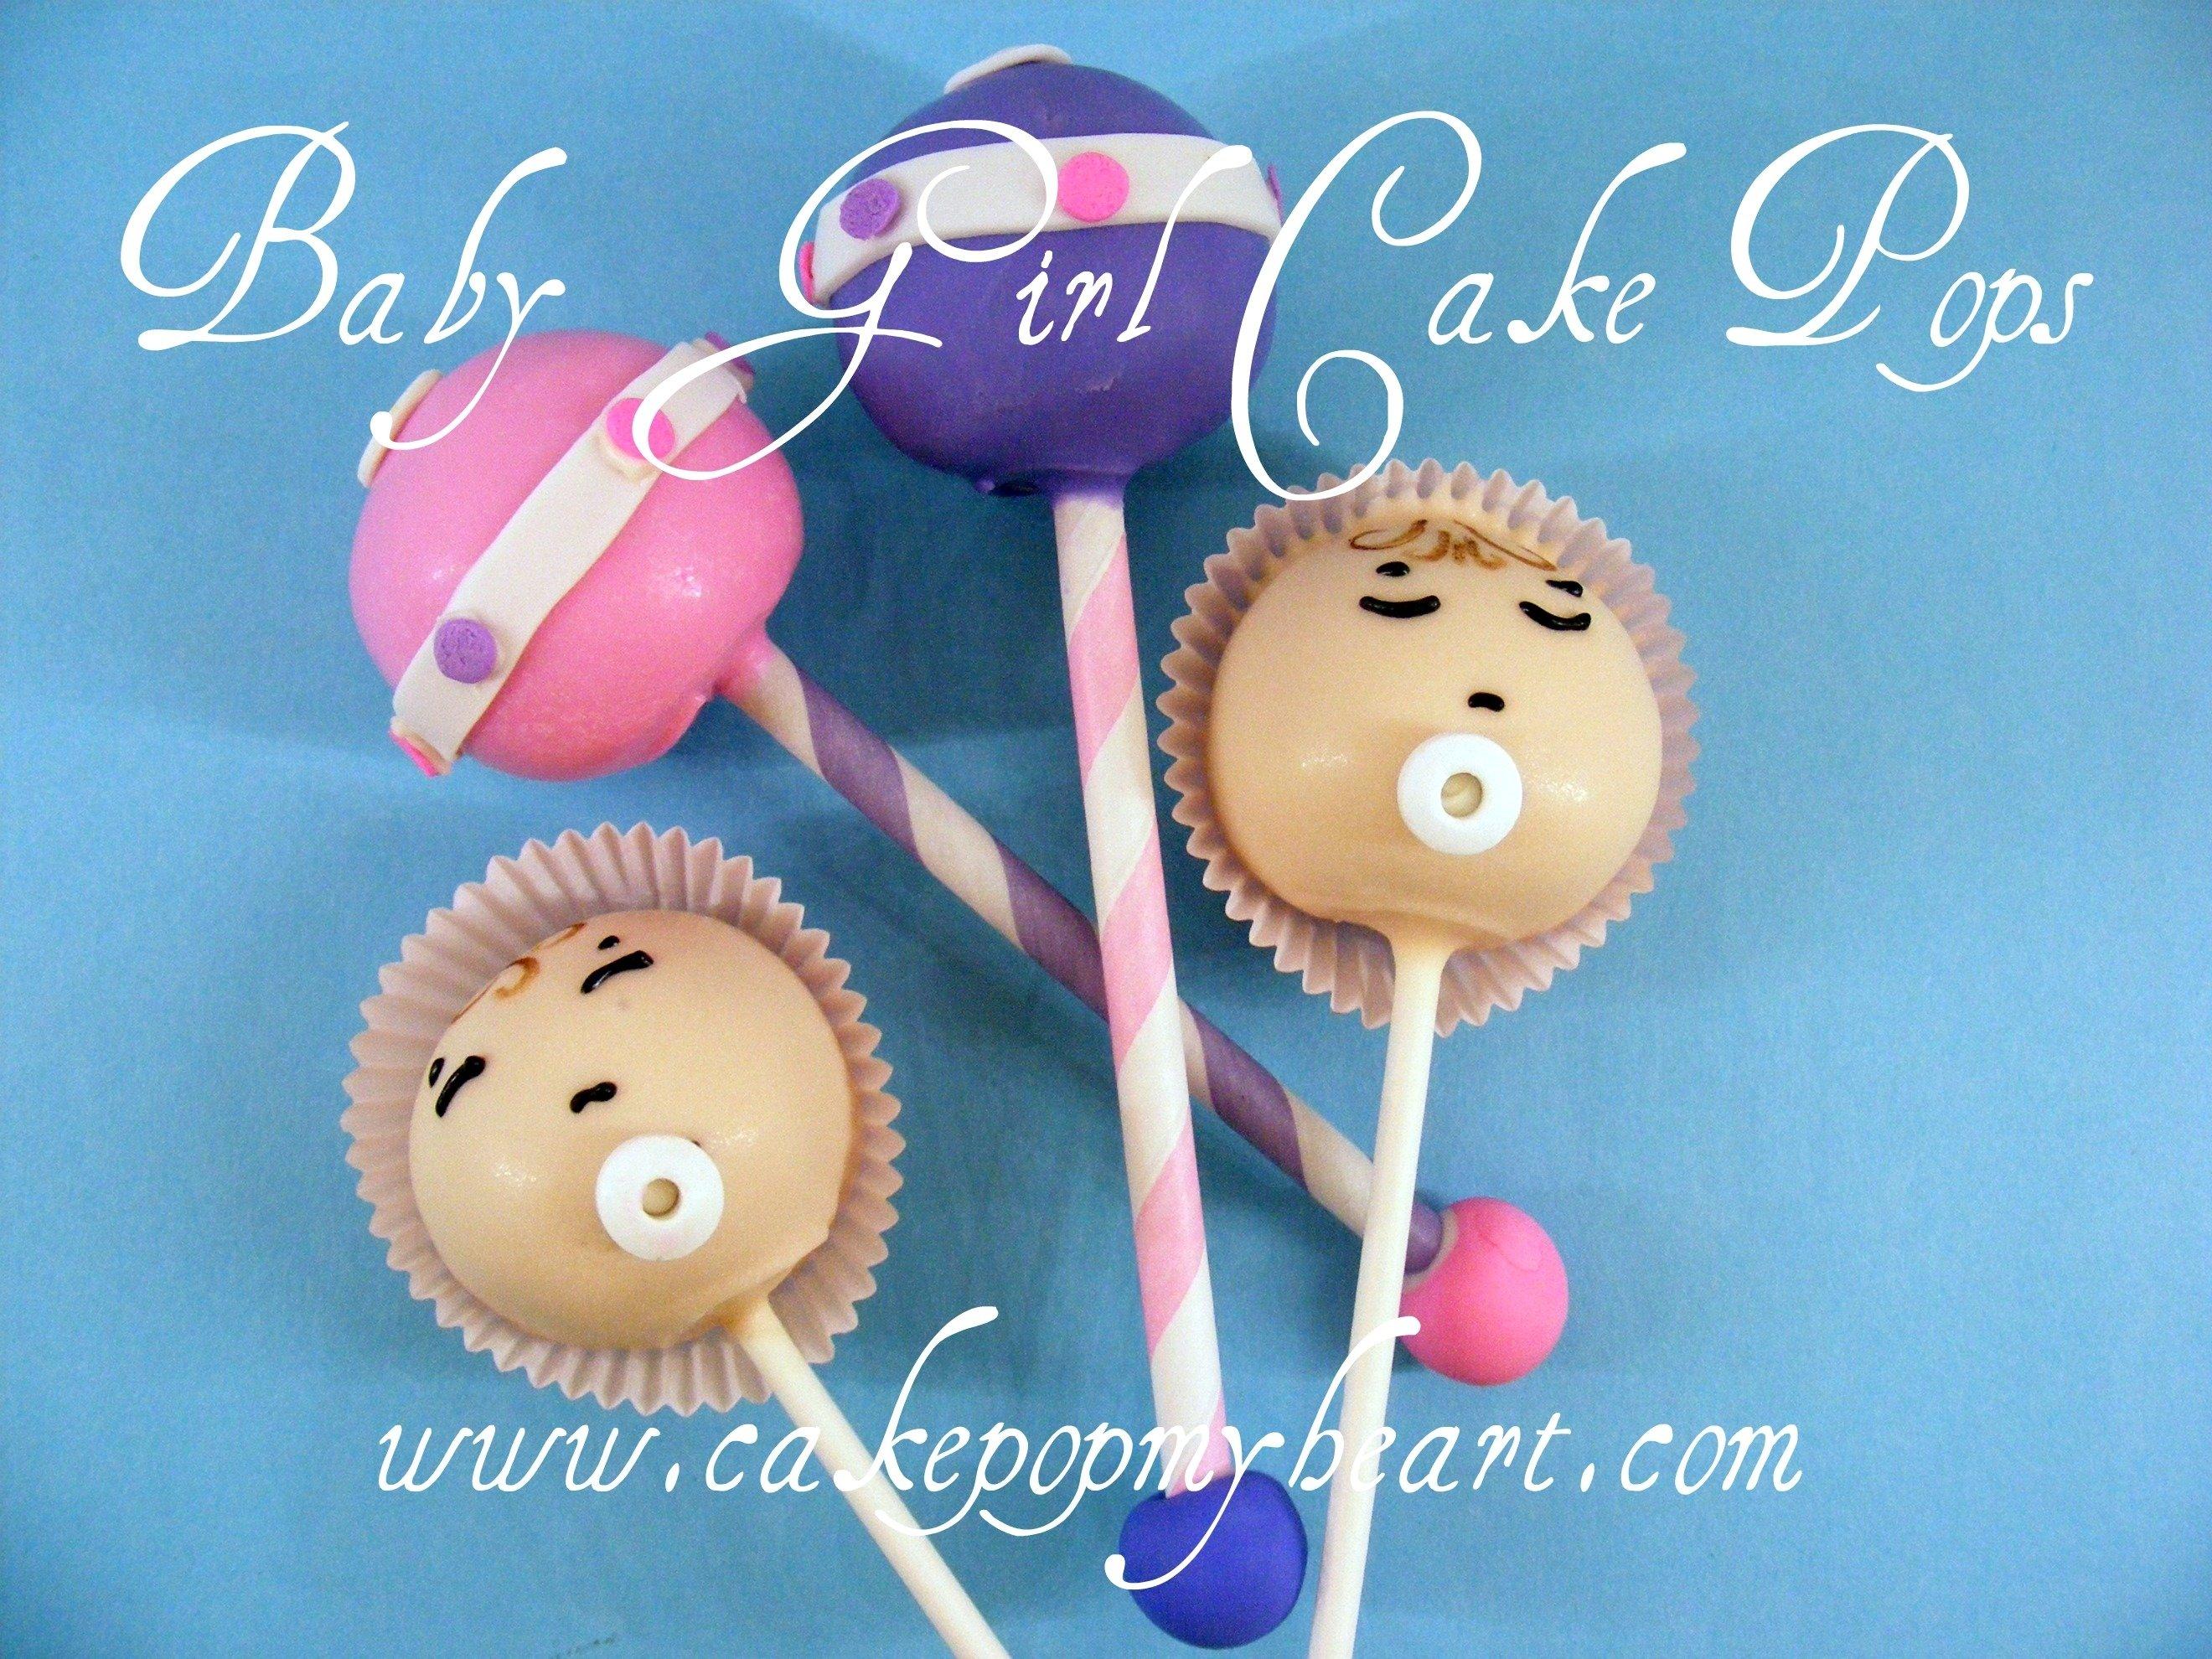 10 Nice Baby Shower Cake Pop Ideas baby shower cake pops cake pop my heart 1 2021